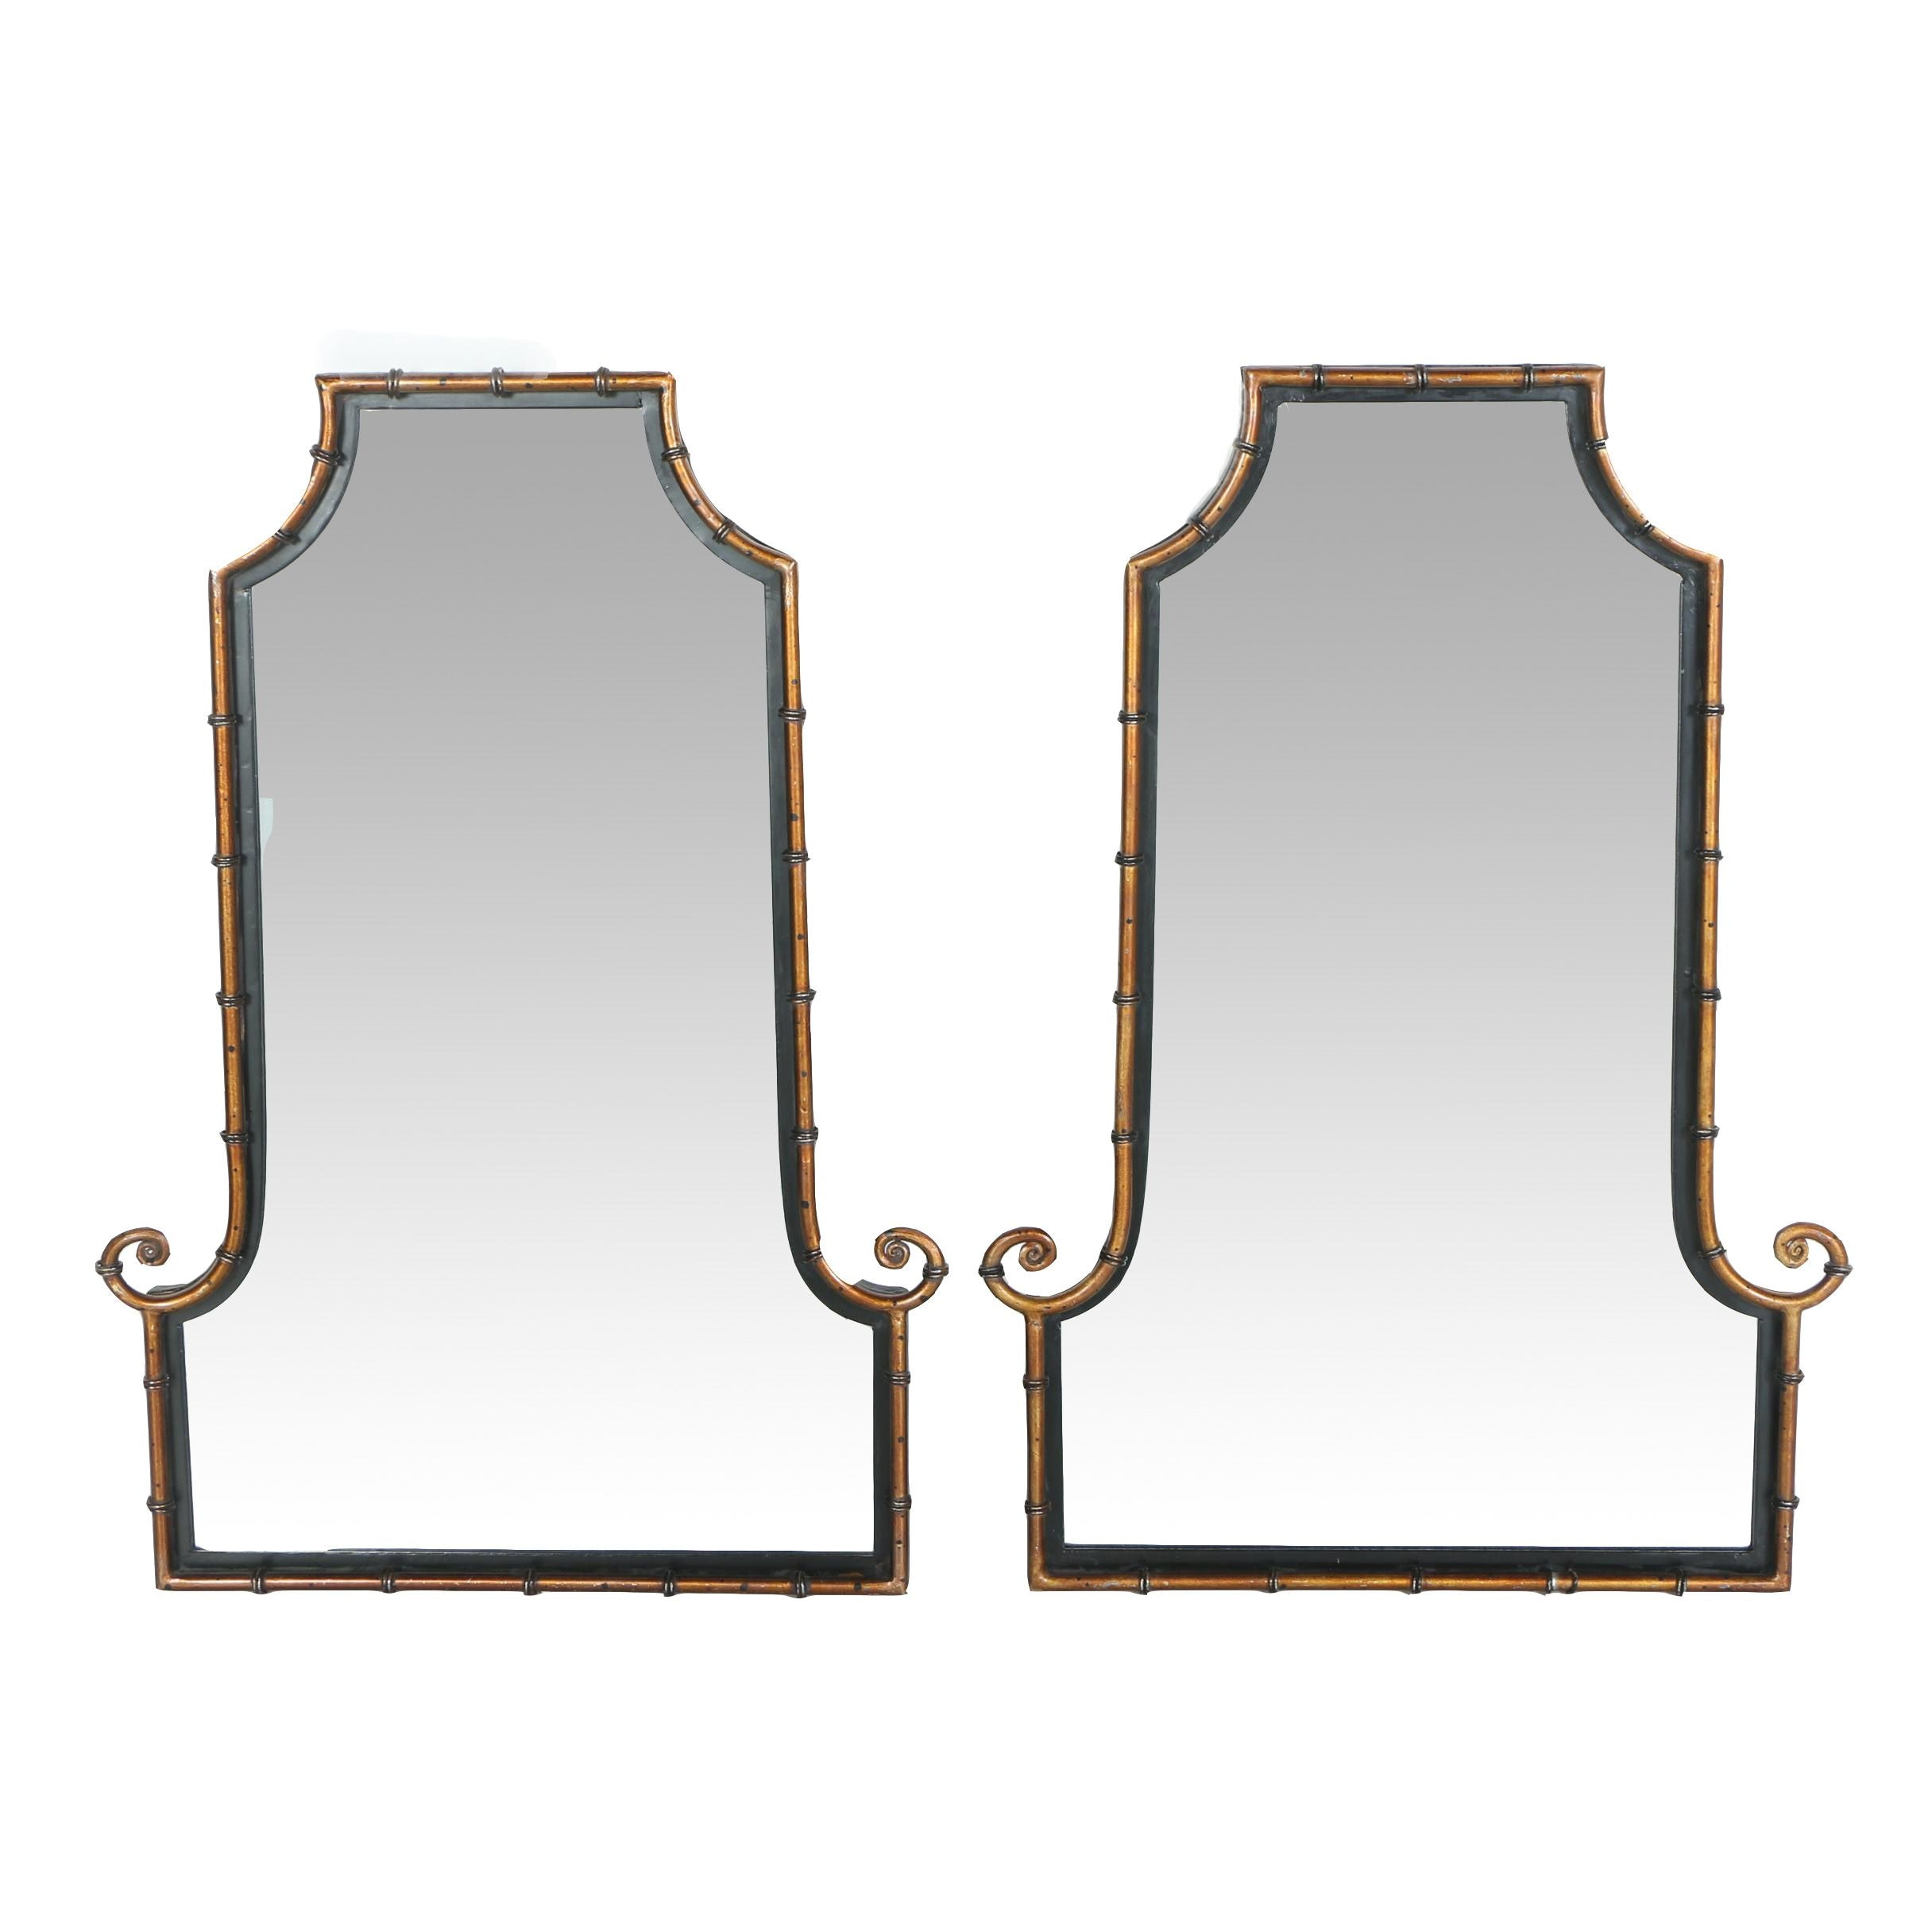 Regency Style Wall Mirrors